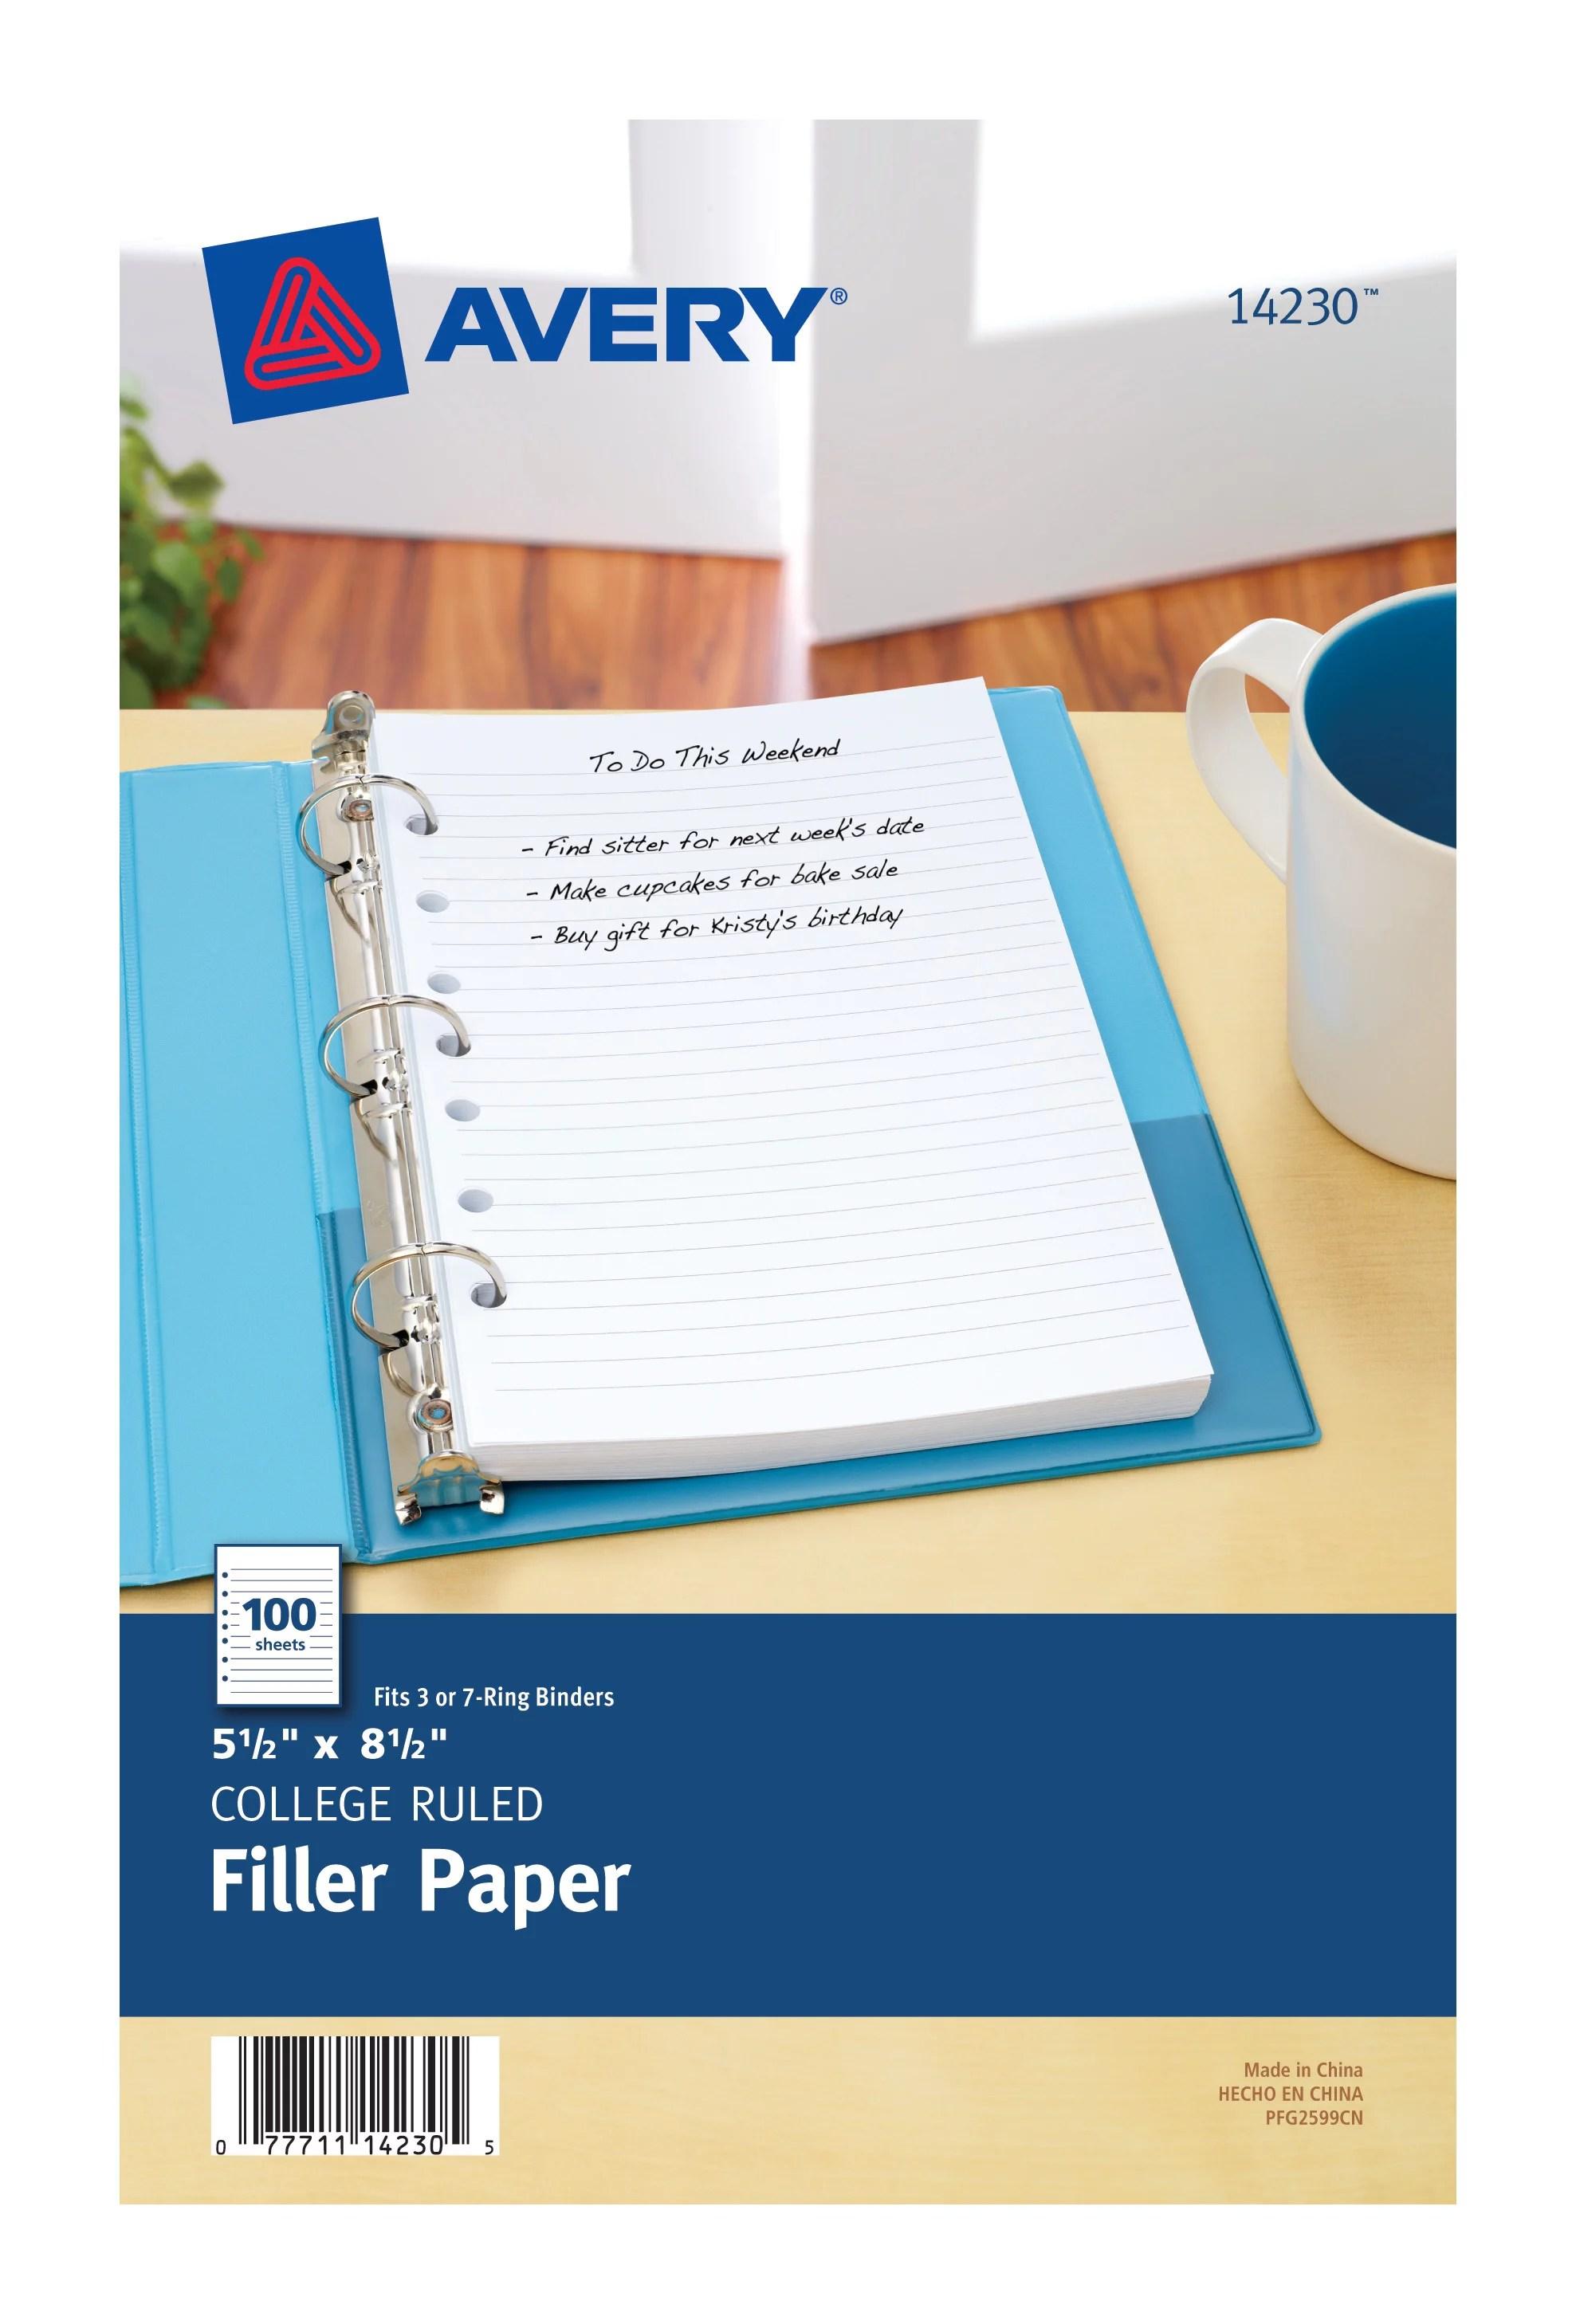 avery 5 1 2 x 8 1 2 mini binder filler paper fits 3 ring 7 ring binders 100 pack